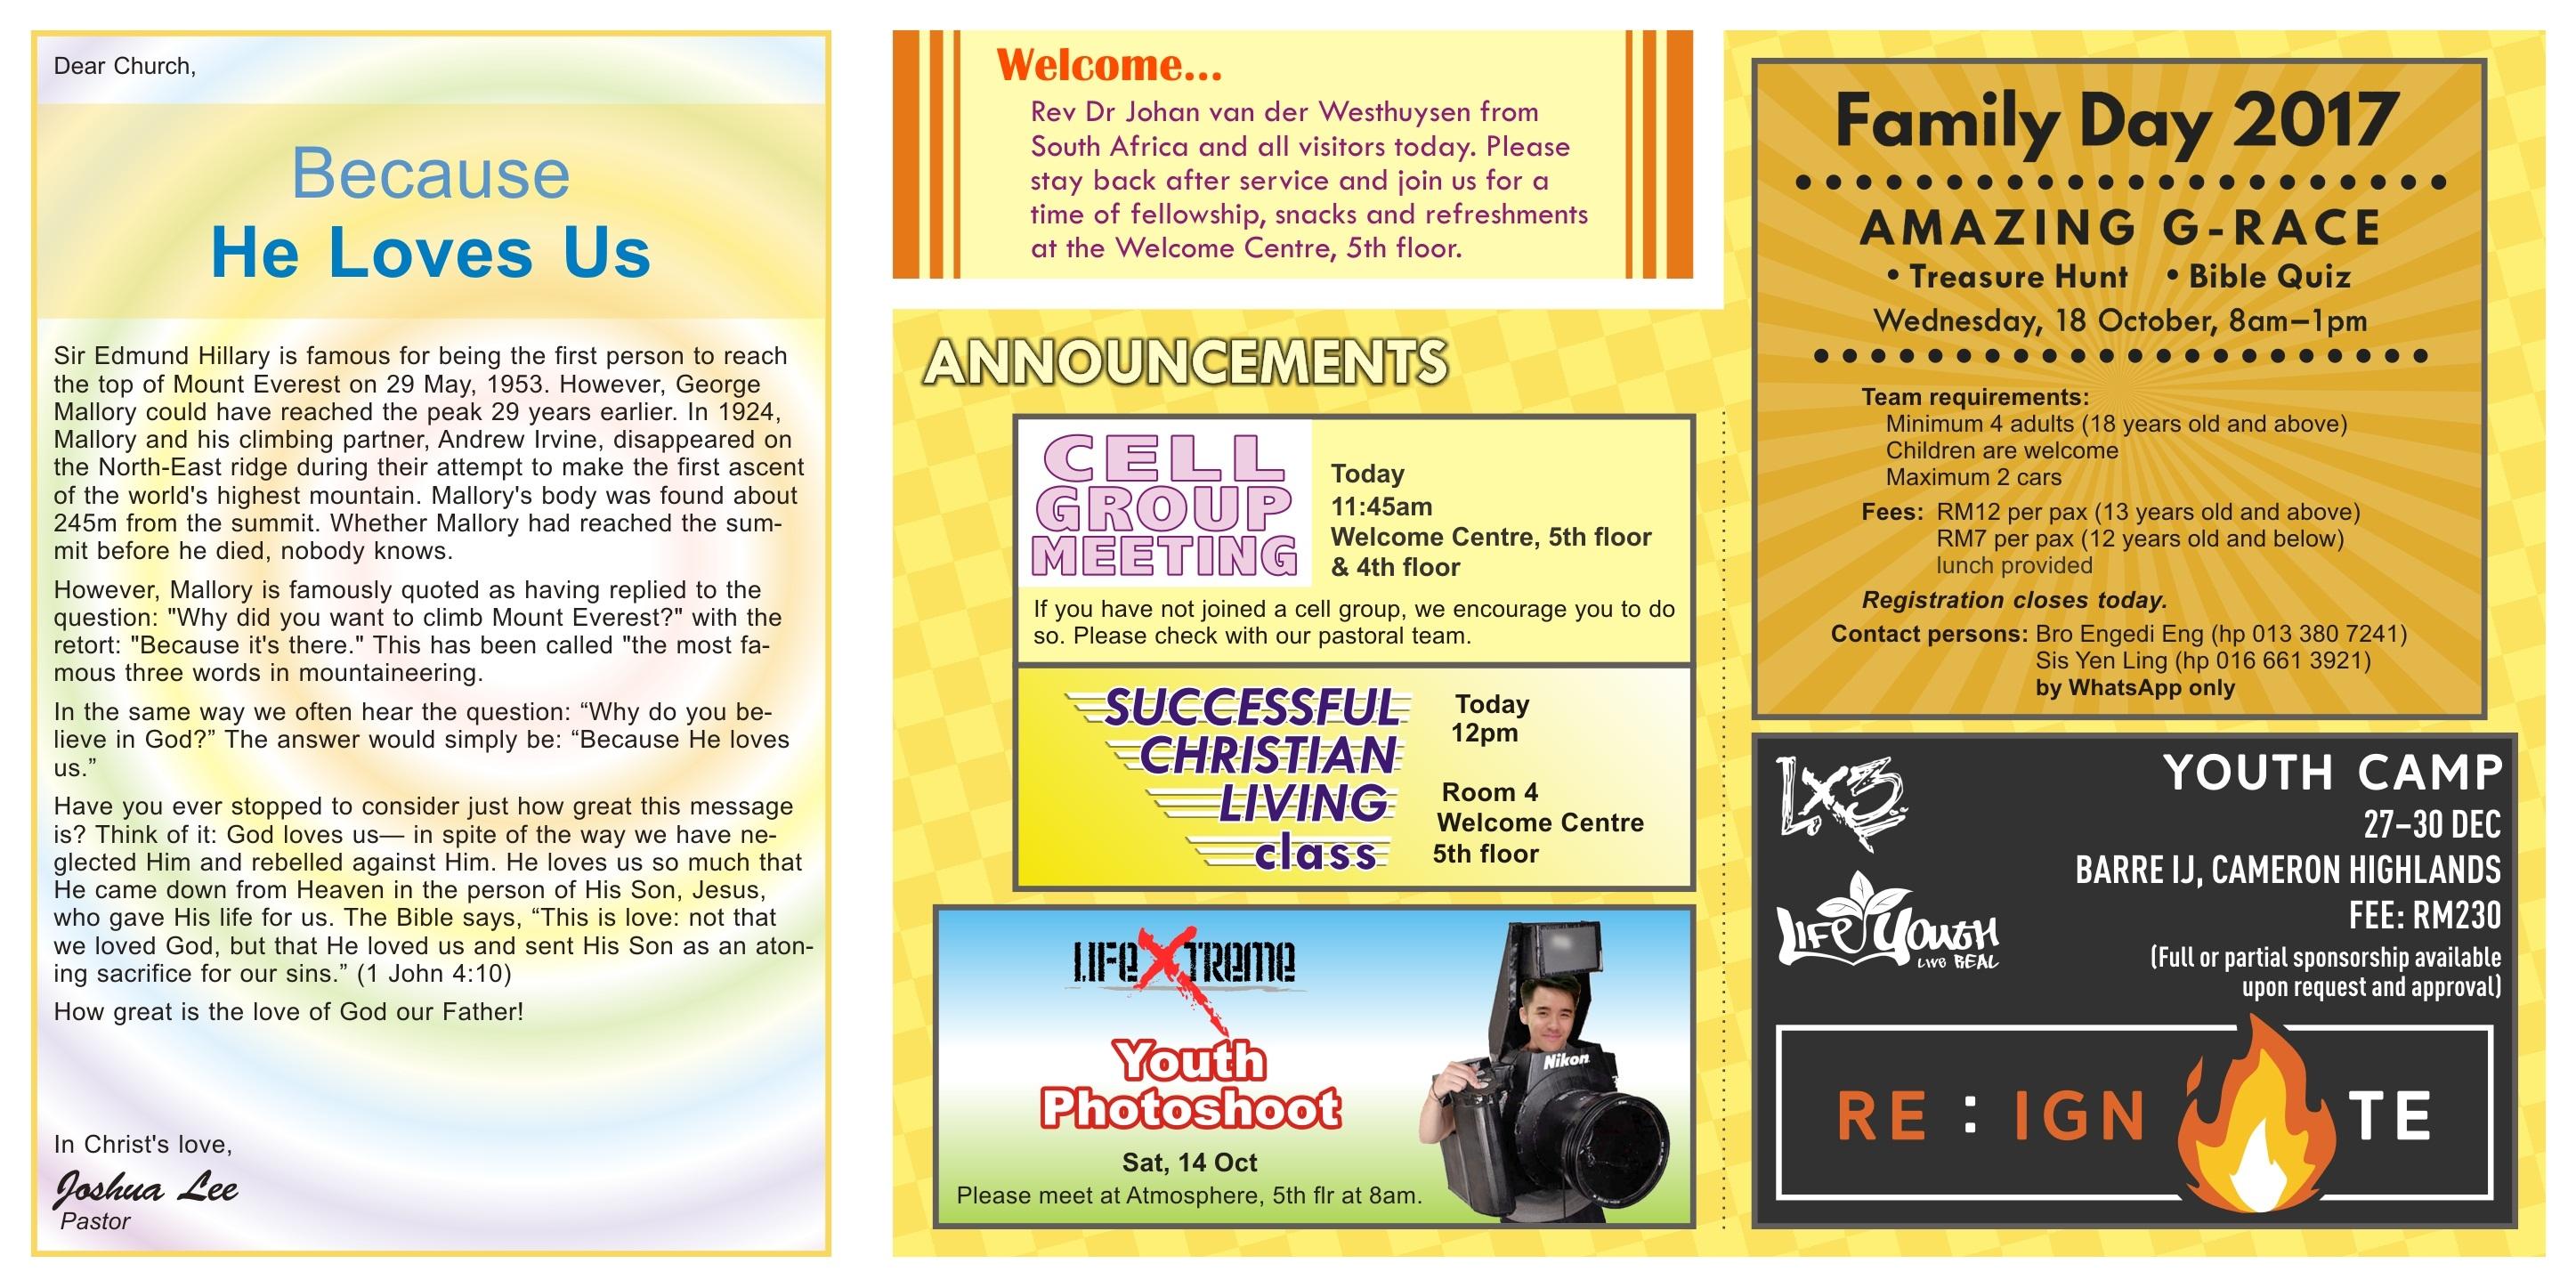 New Life Restoration Centre Shah Alam Bulletin 8th October 2017